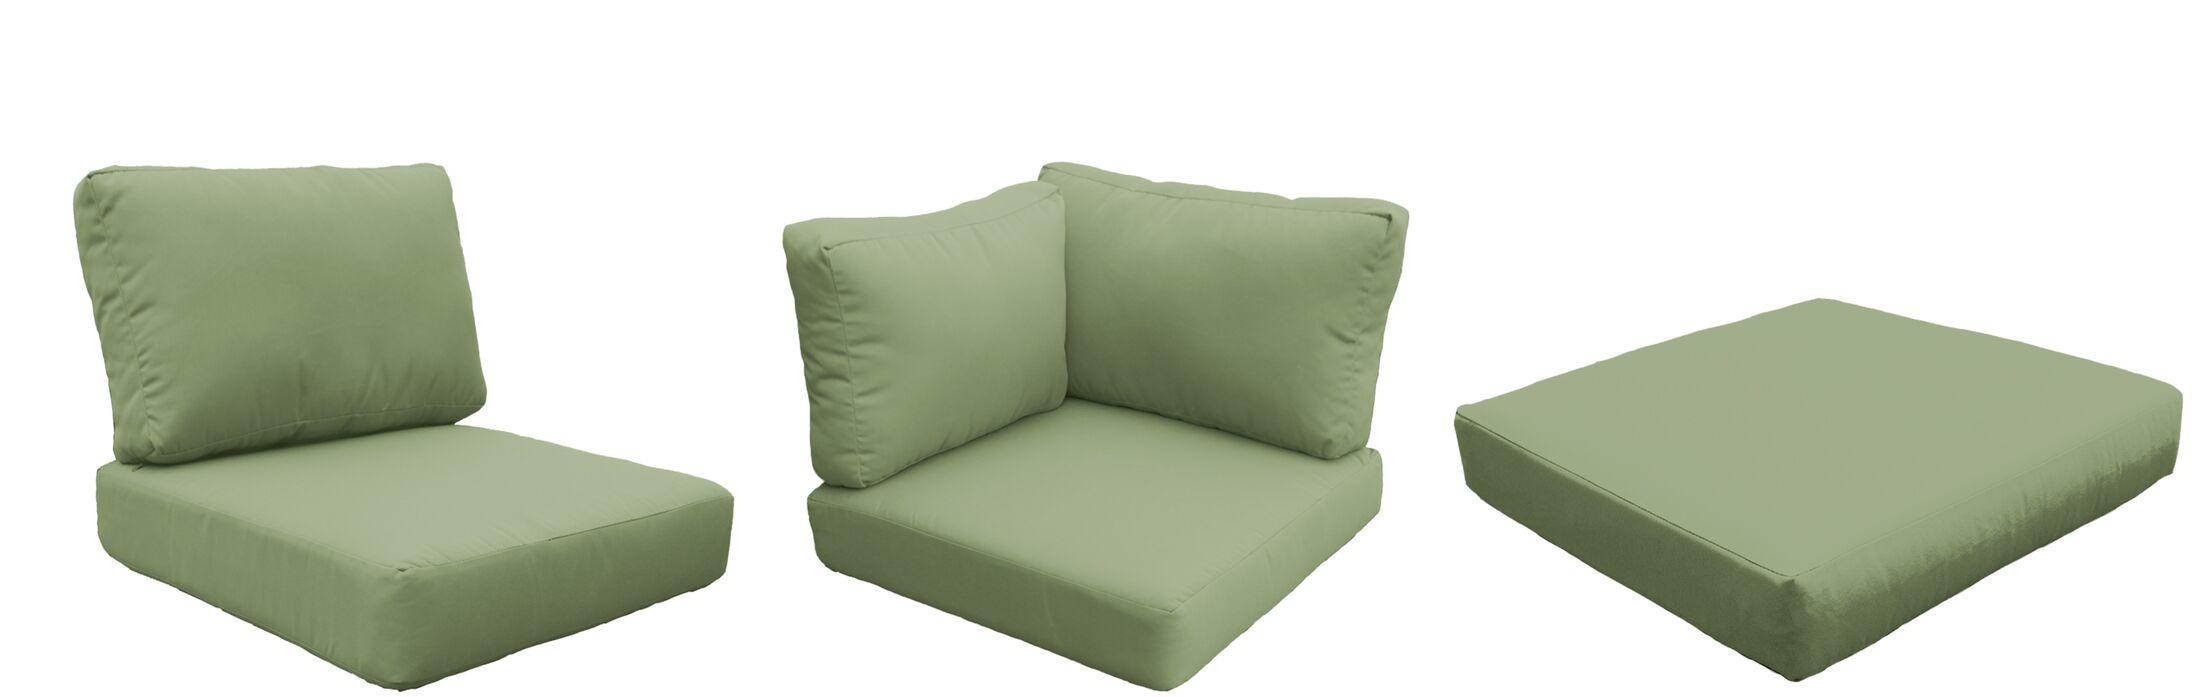 East Village Outdoor 22 Piece Lounge Chair Cushion Set Fabric: Cilantro